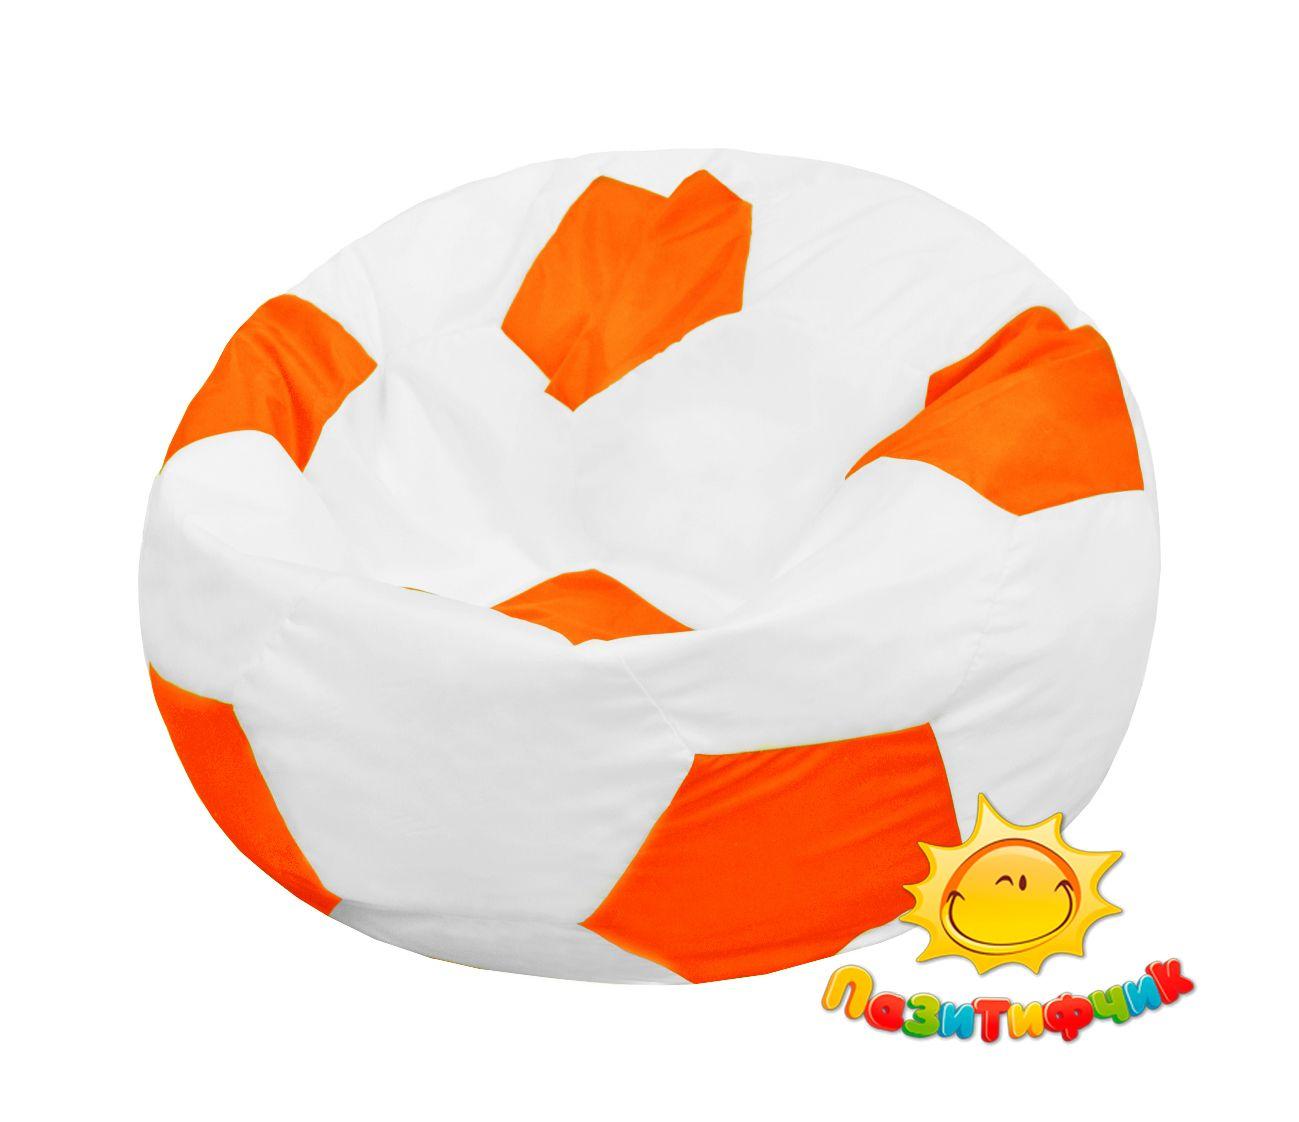 Кресло-мяч Pazitif Мяч Пазитифчик, размер XL, оксфорд, бело-оранжевый фото